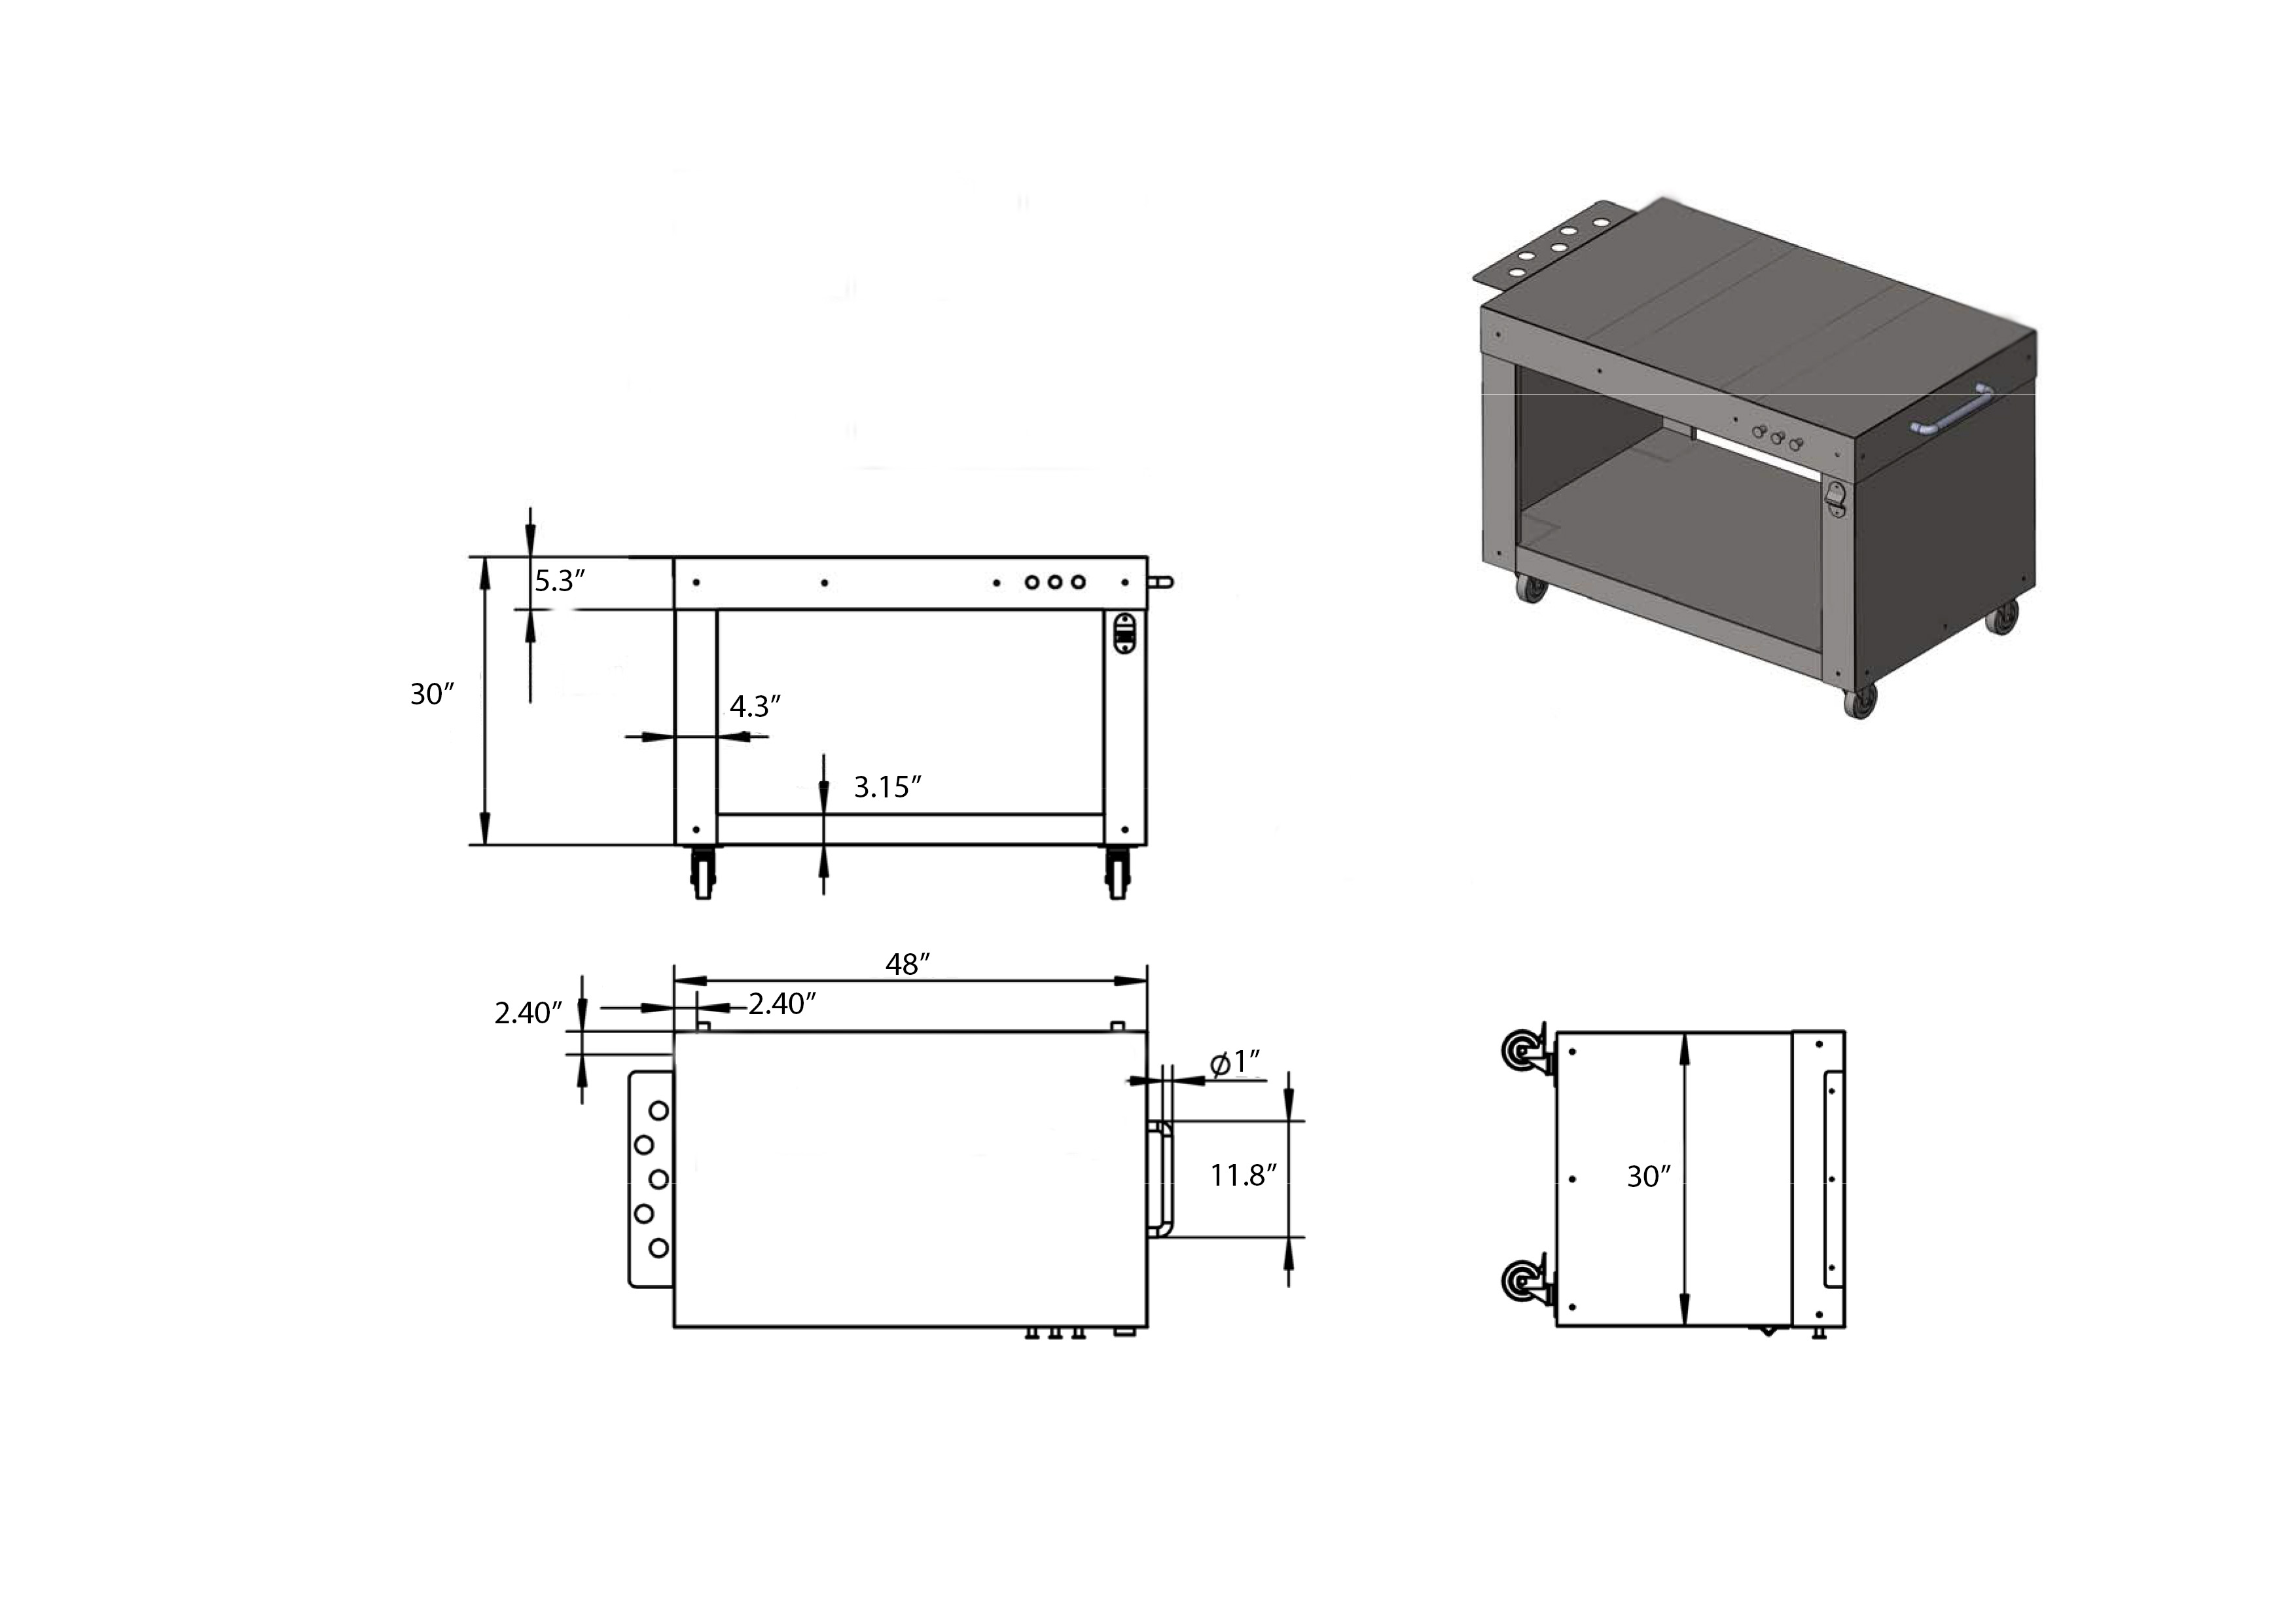 table-sketch-size2.jpg